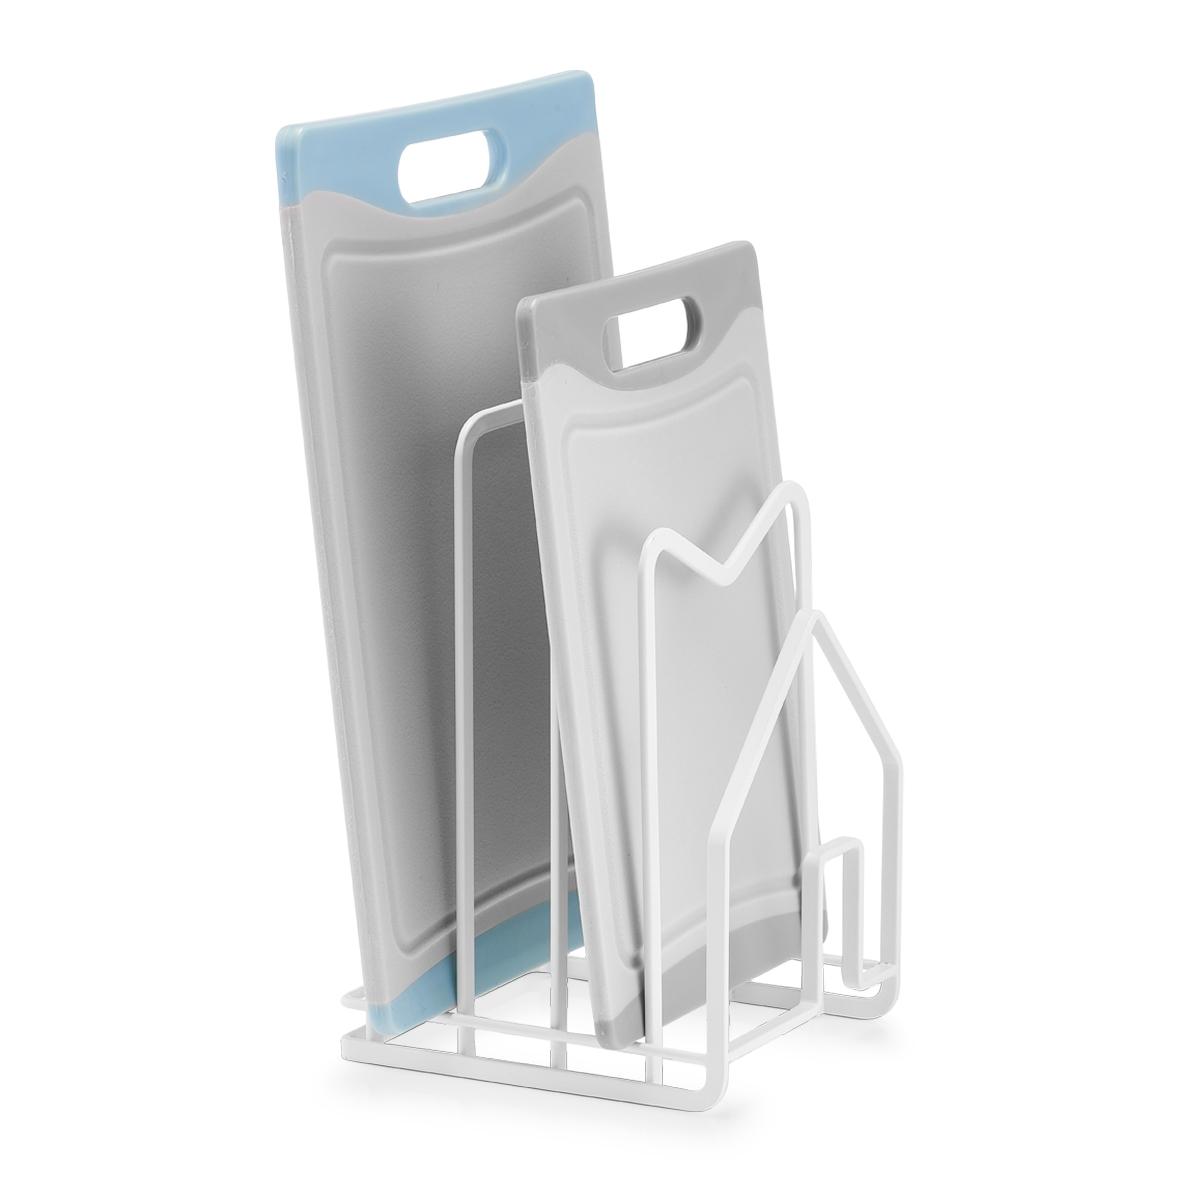 Suport metalic pentru vesela si accesorii, Drain Alb, L14,5xl12xH21,5 cm imagine